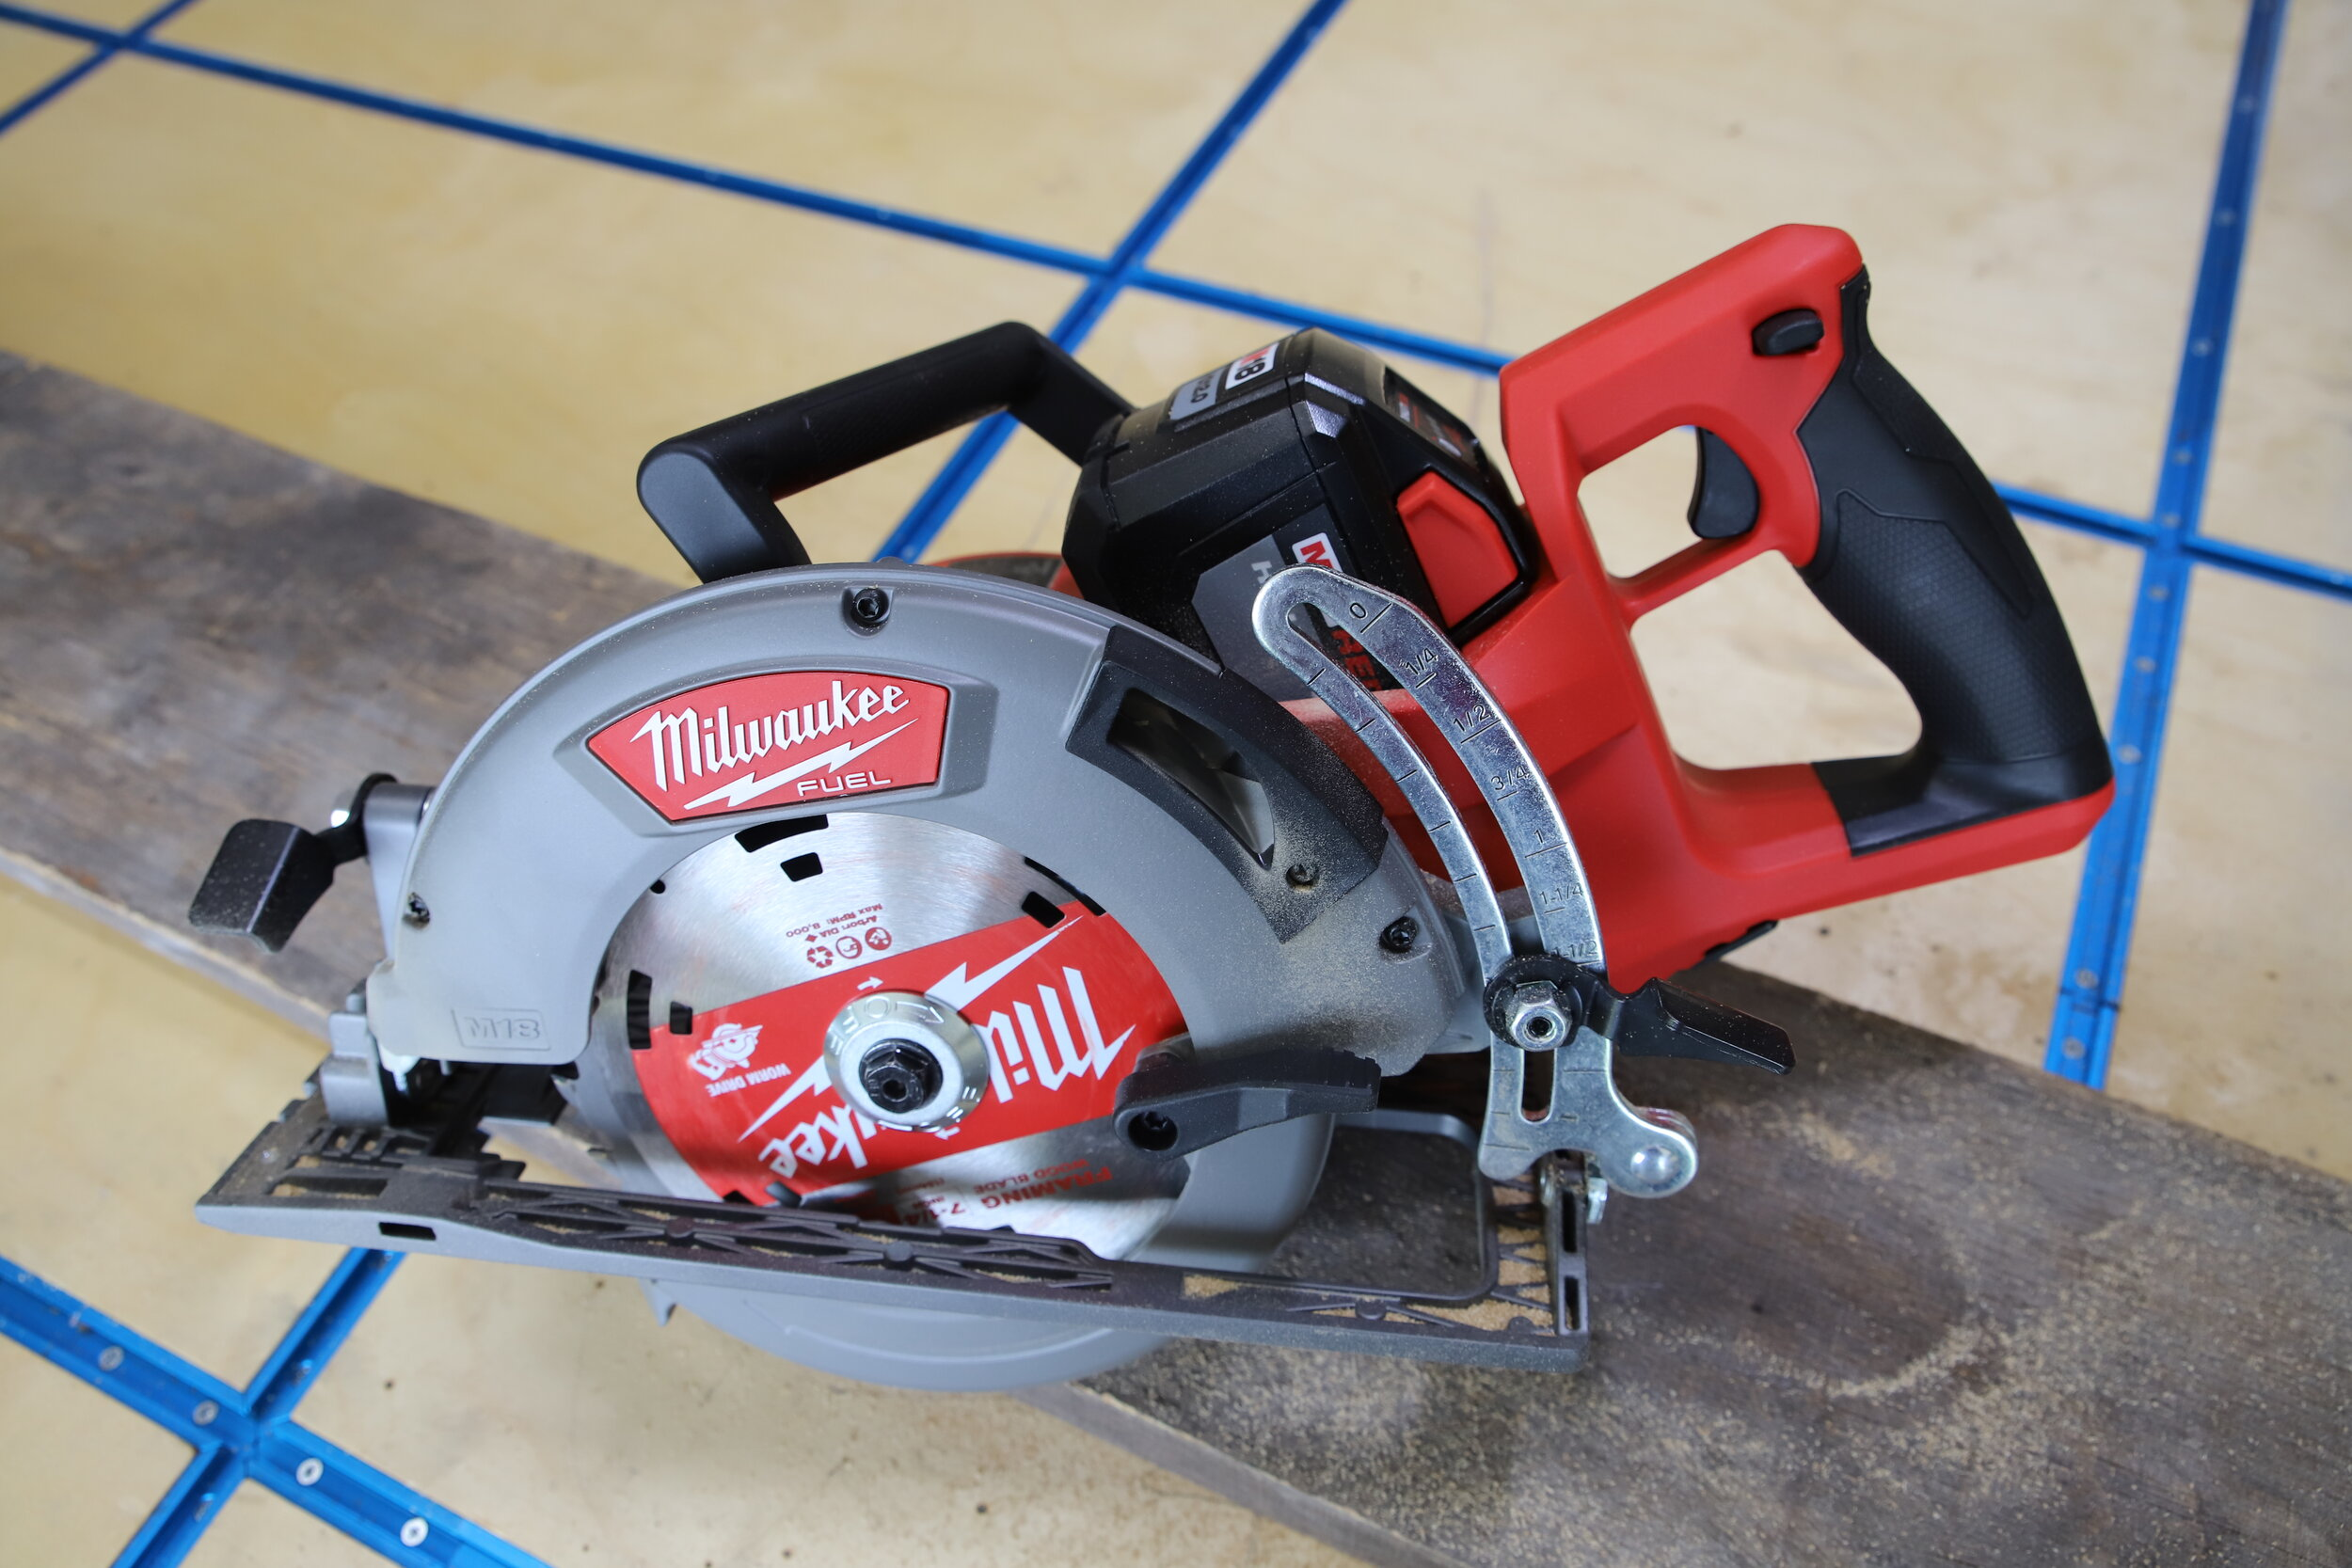 Milwaukee Rear Drive Circular Saw Review Jonny Builds